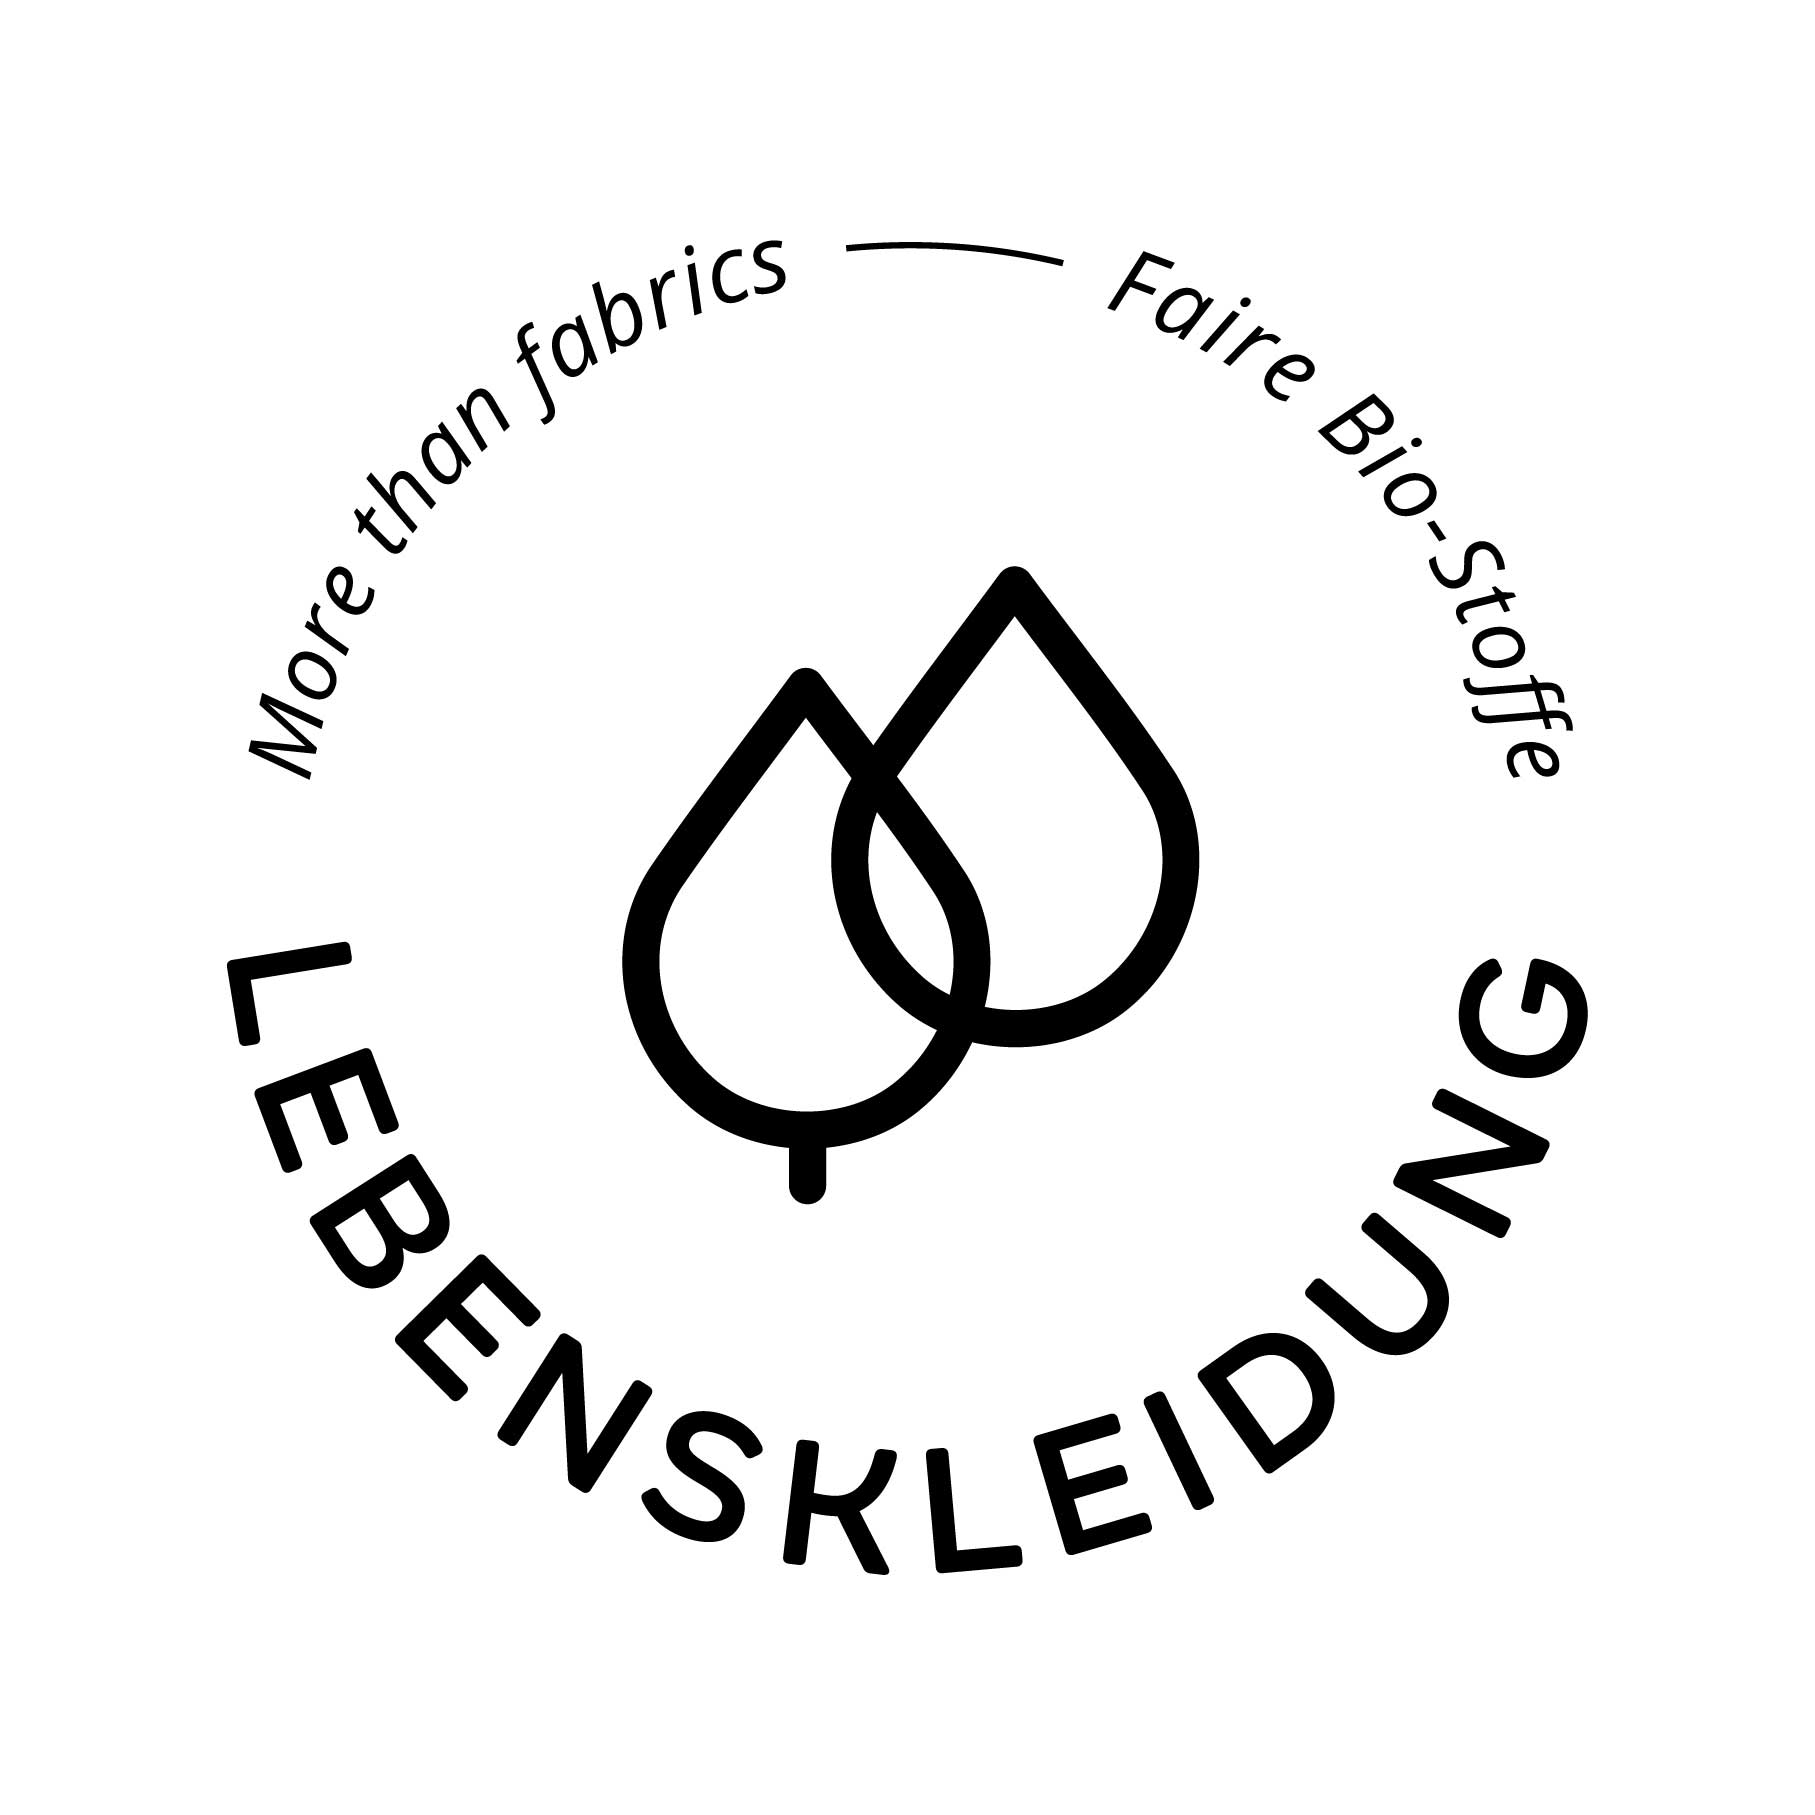 Tessuti organici Cordone di gomma - 40% cotone organico 60% gomma naturale -  adatto per tessuti leggeri e di peso medio - 2,2mm diámetro -  Ecru  - 100 Metros-2